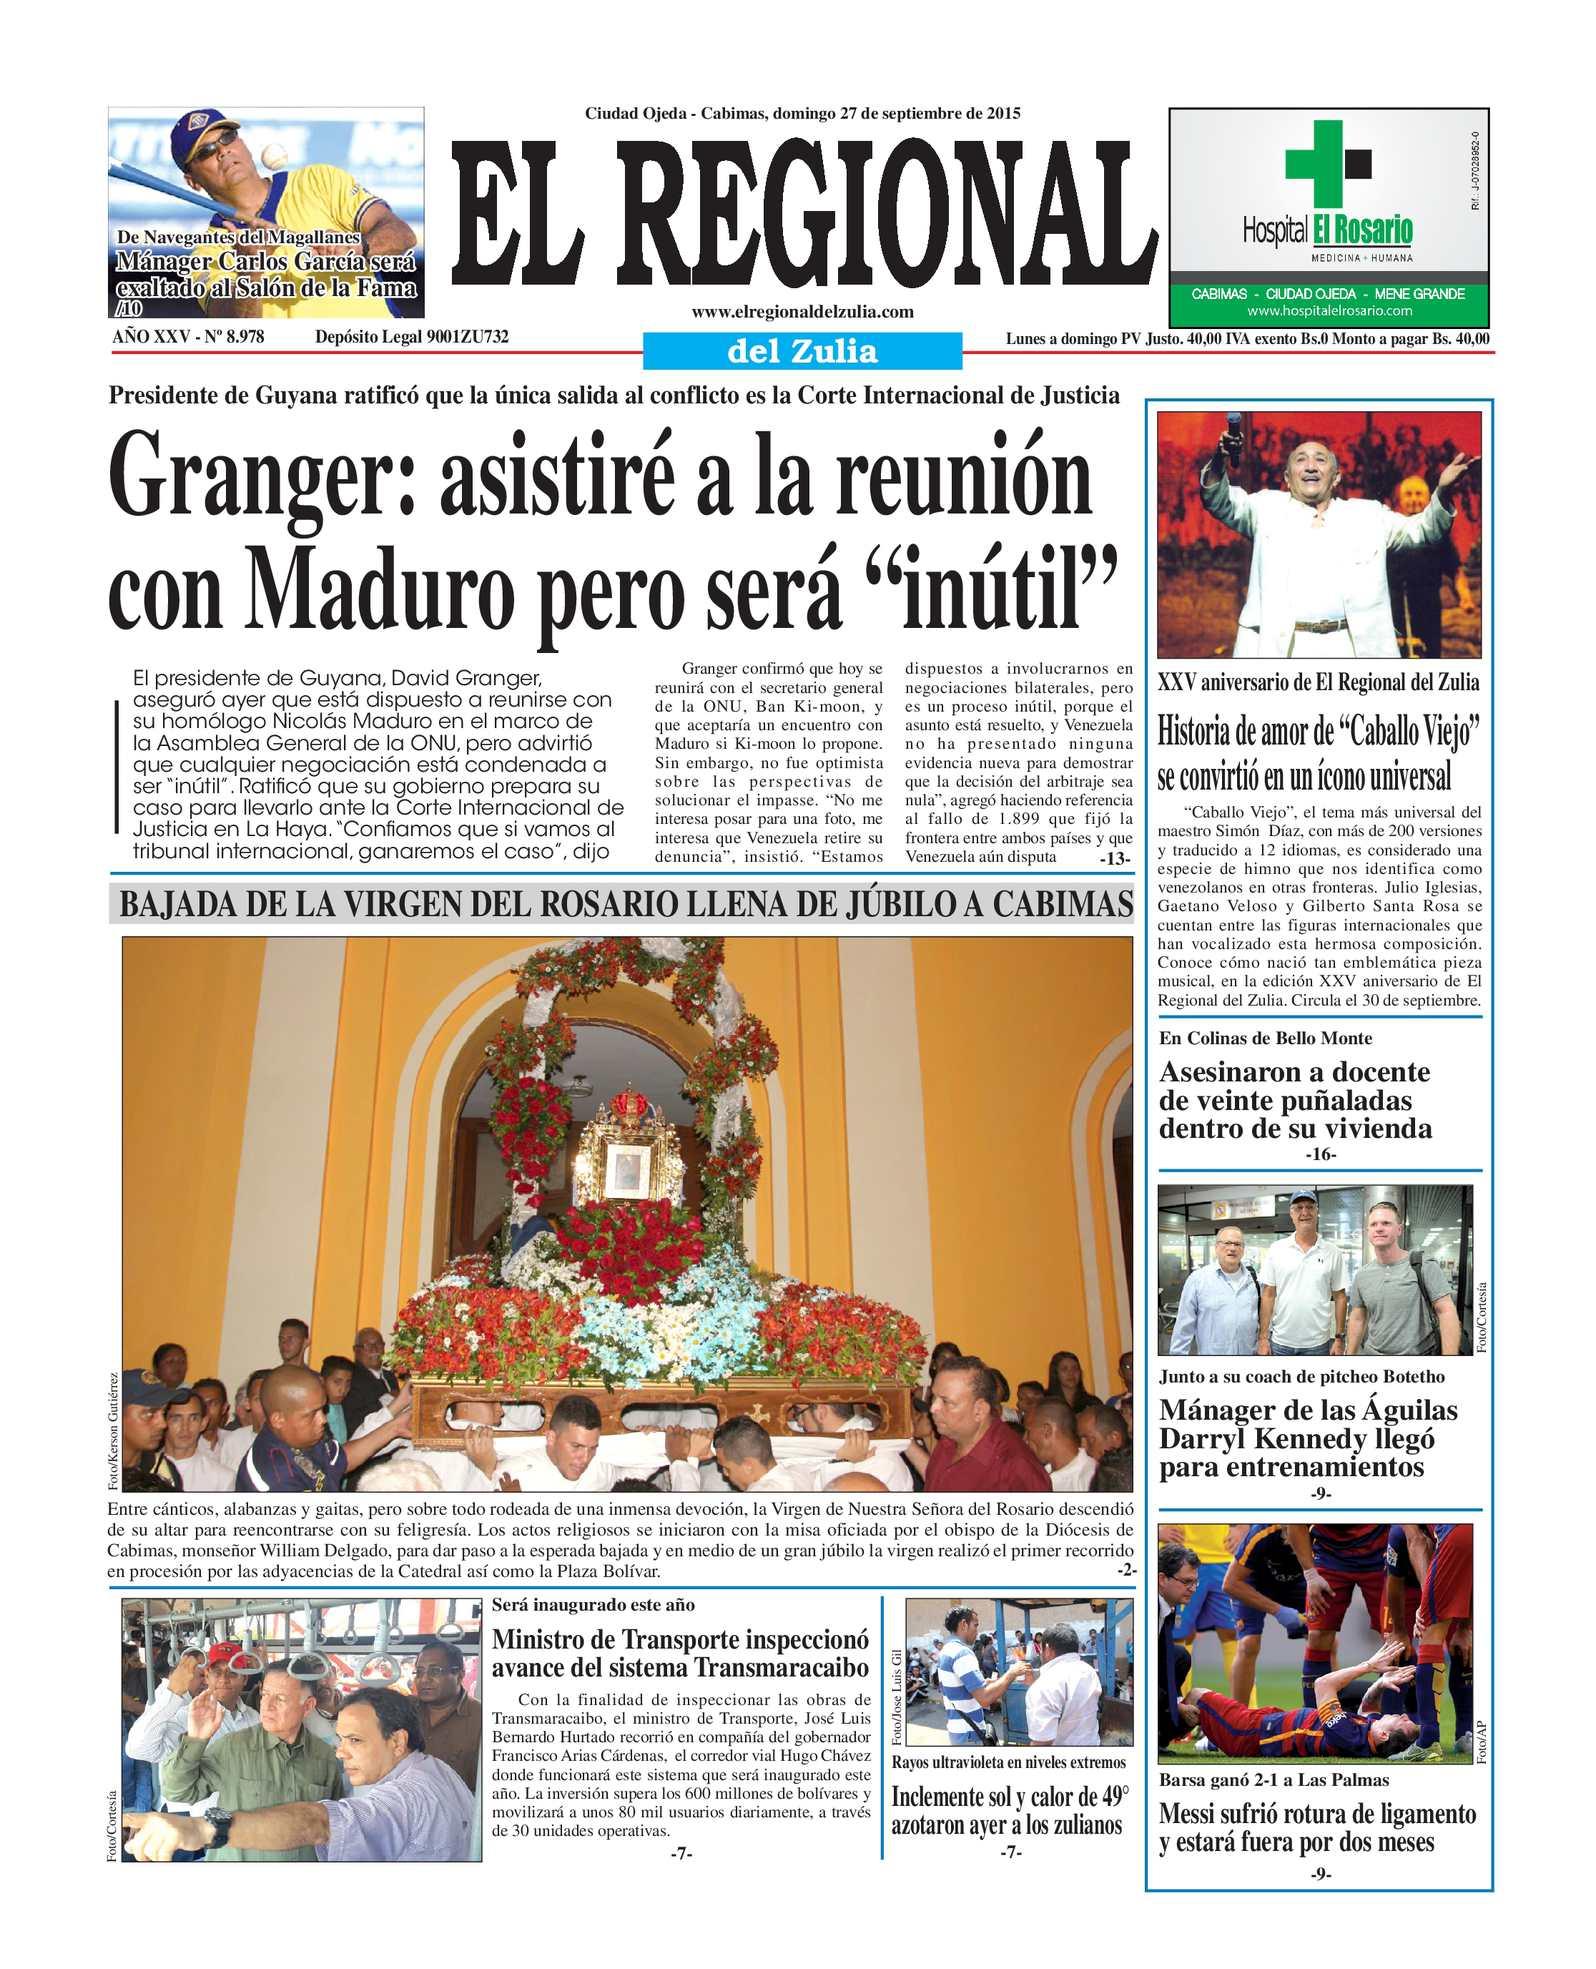 Calaméo - El Regional del Zulia 27-09-2015